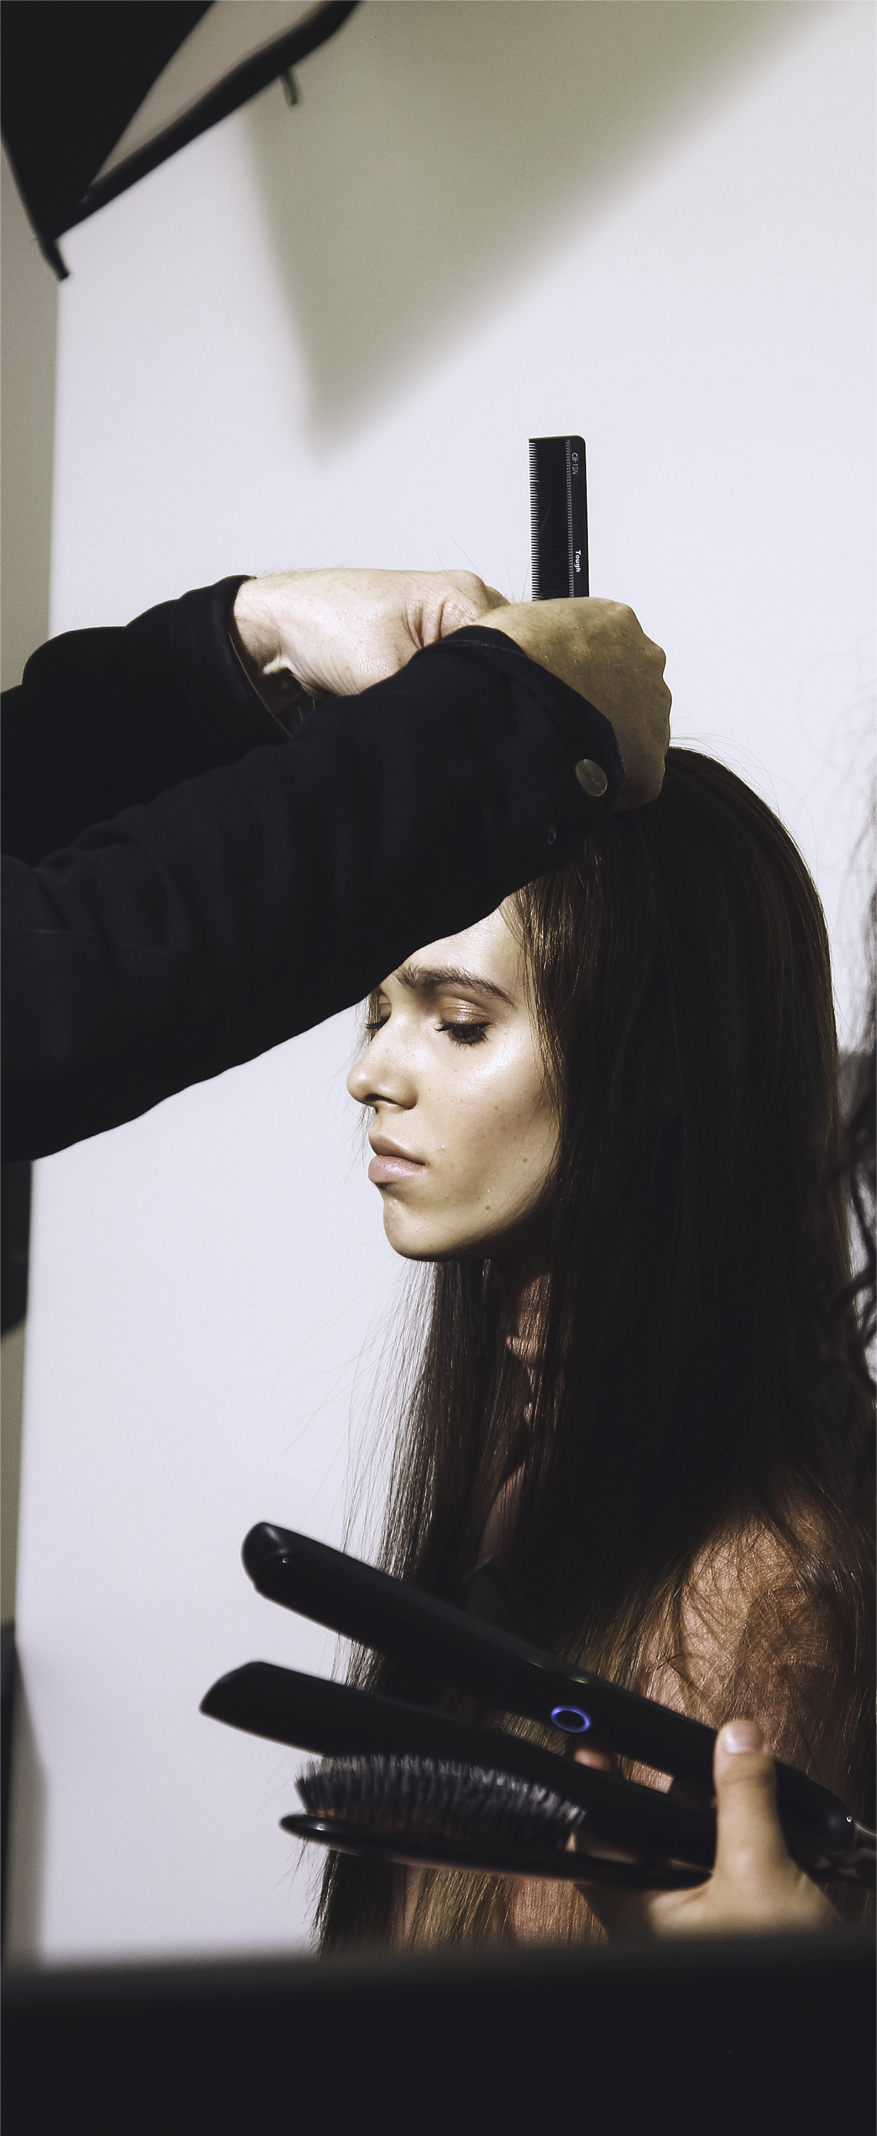 Elle magazine and GHD live shoot 7.jpg